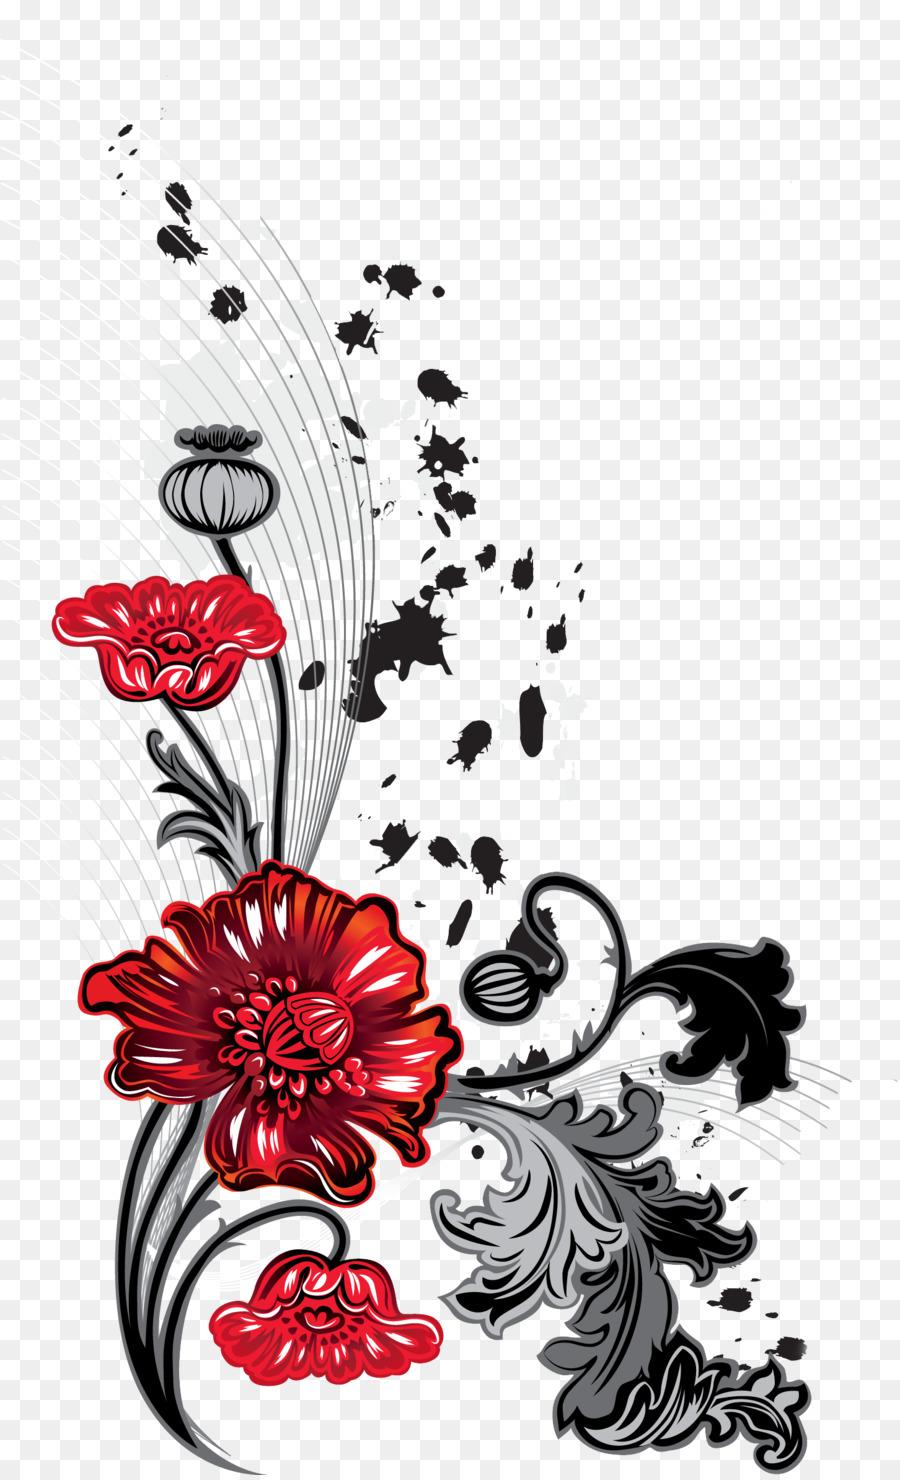 Desktop Wallpaper Animation - flower ornaments png download - 1452 ...